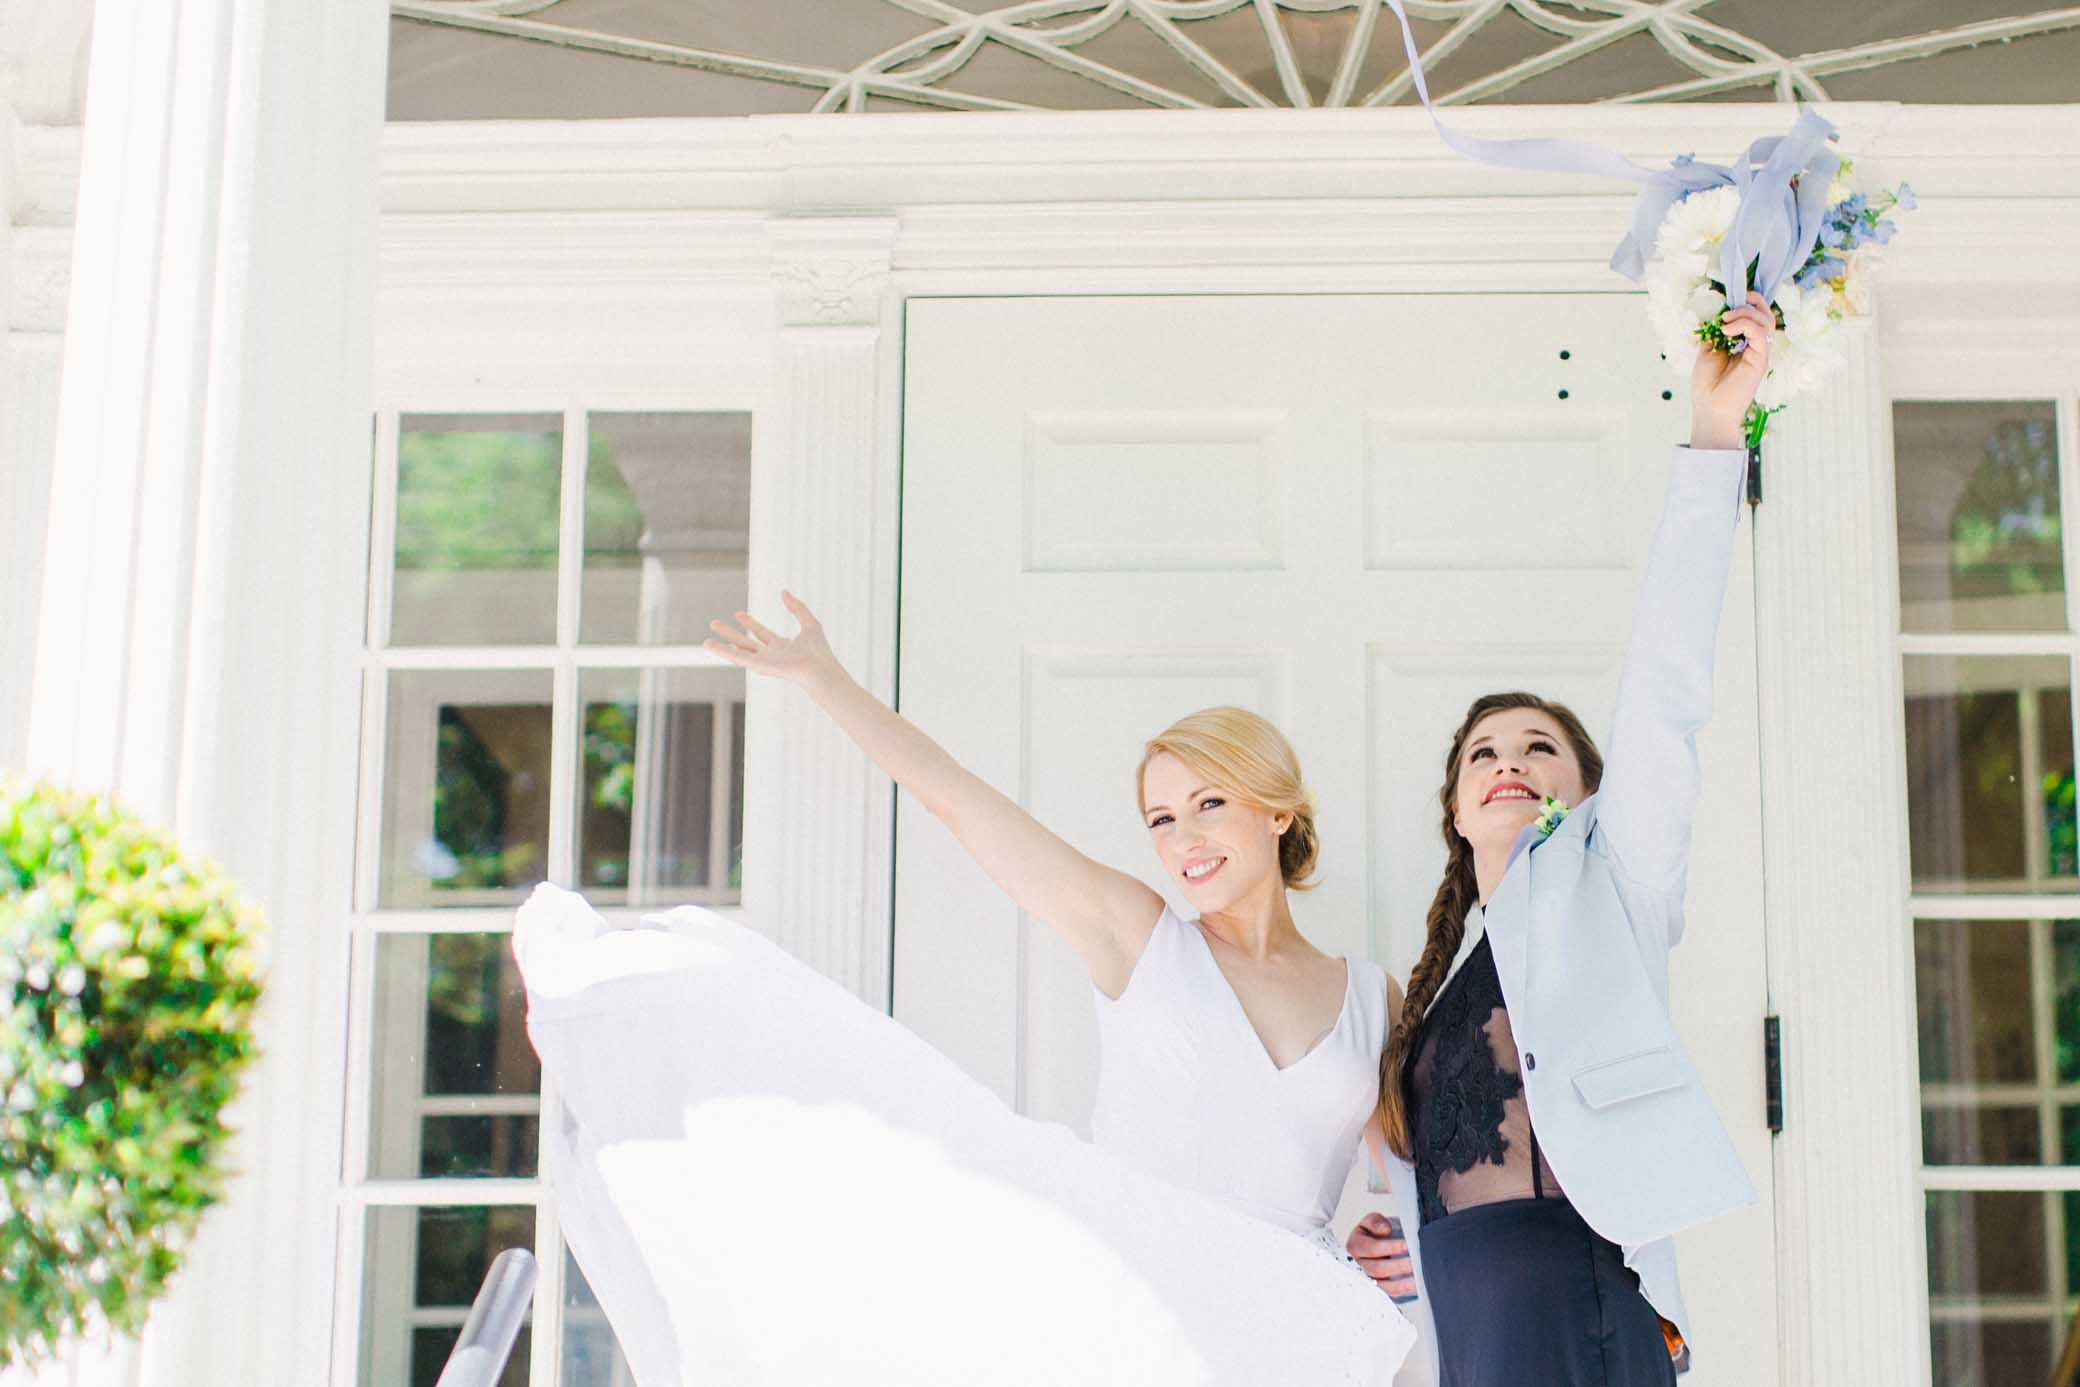 Minneapolis Wedding Photographer Sea Circus lesbian gay same-sex Weddings Dancing With Her magazine